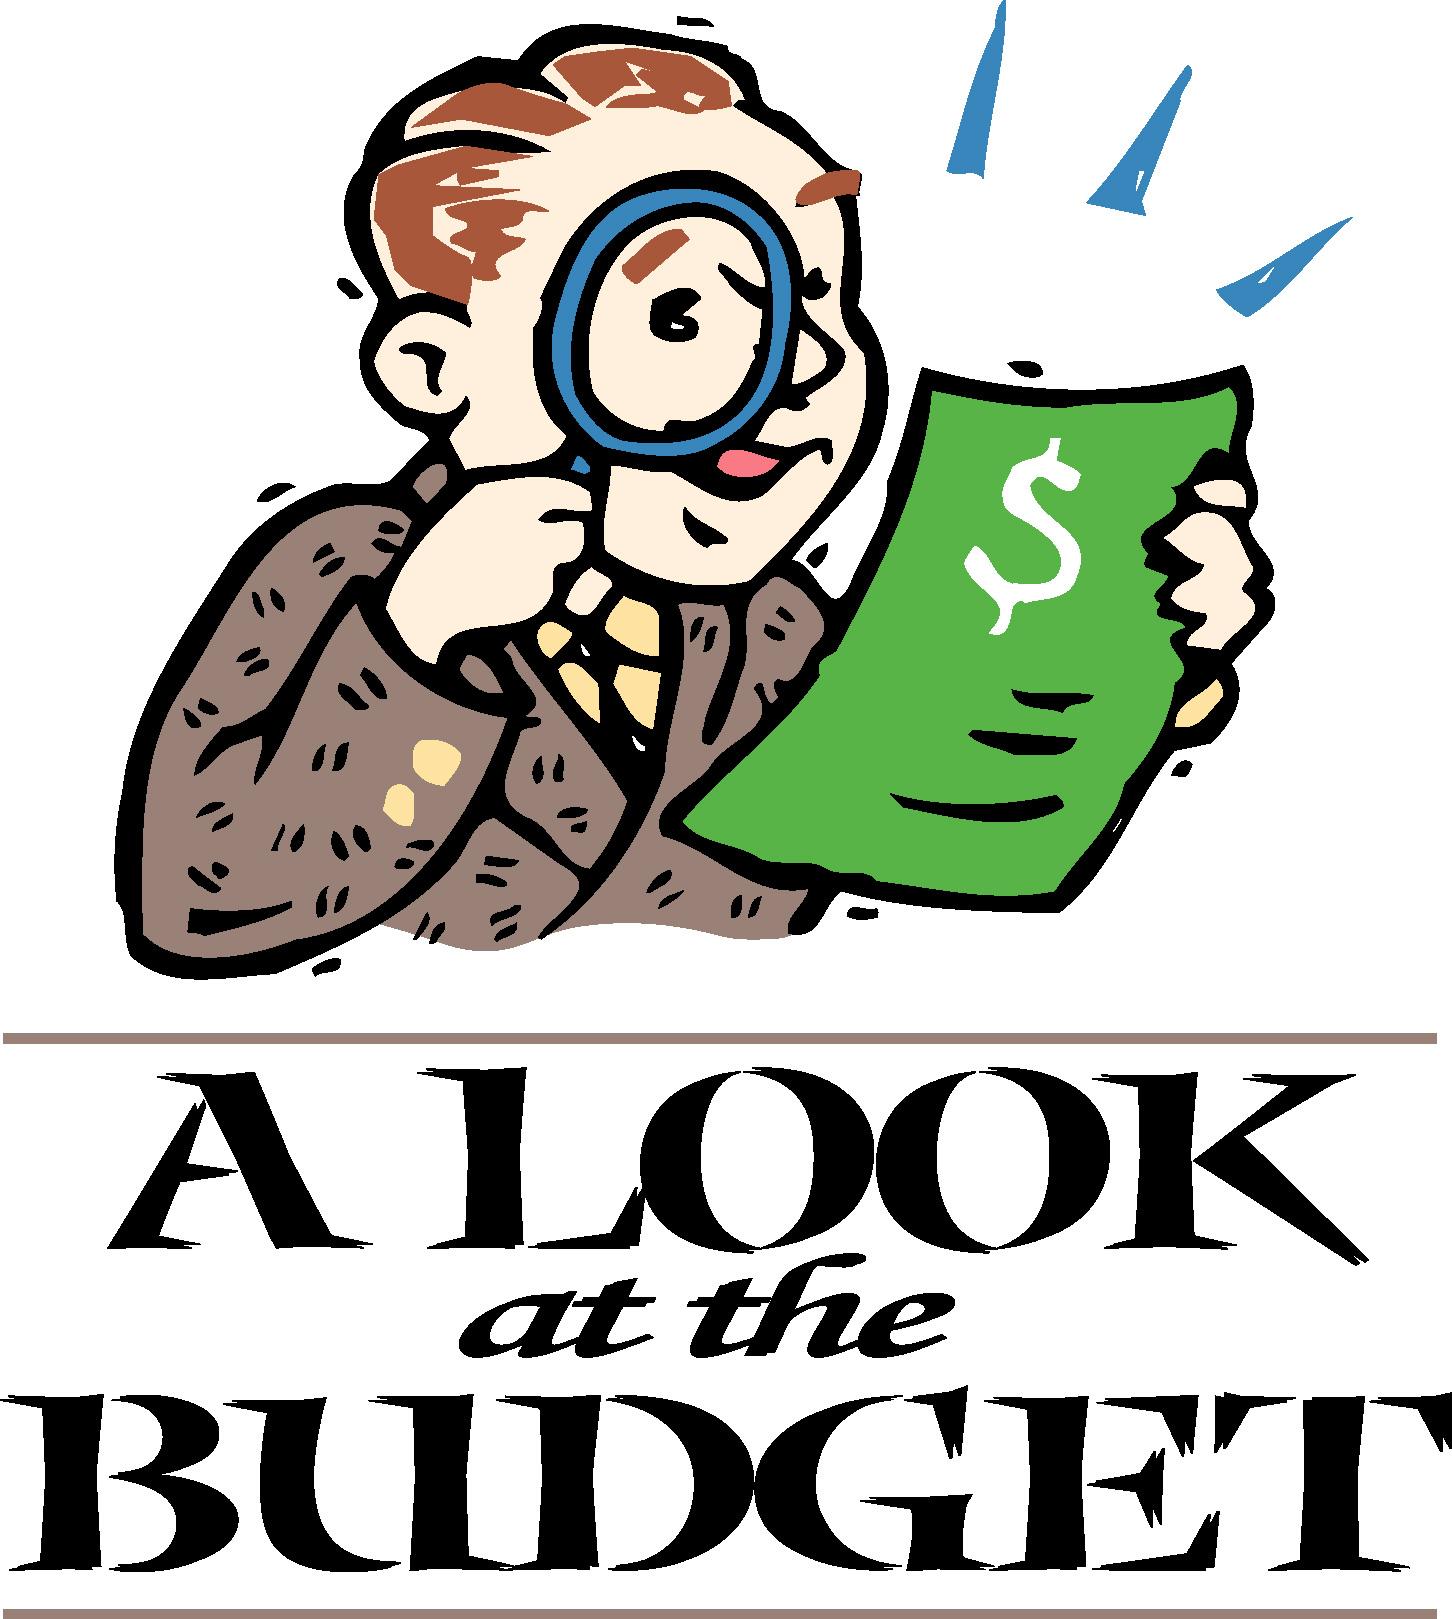 Budget Clip Art free image.